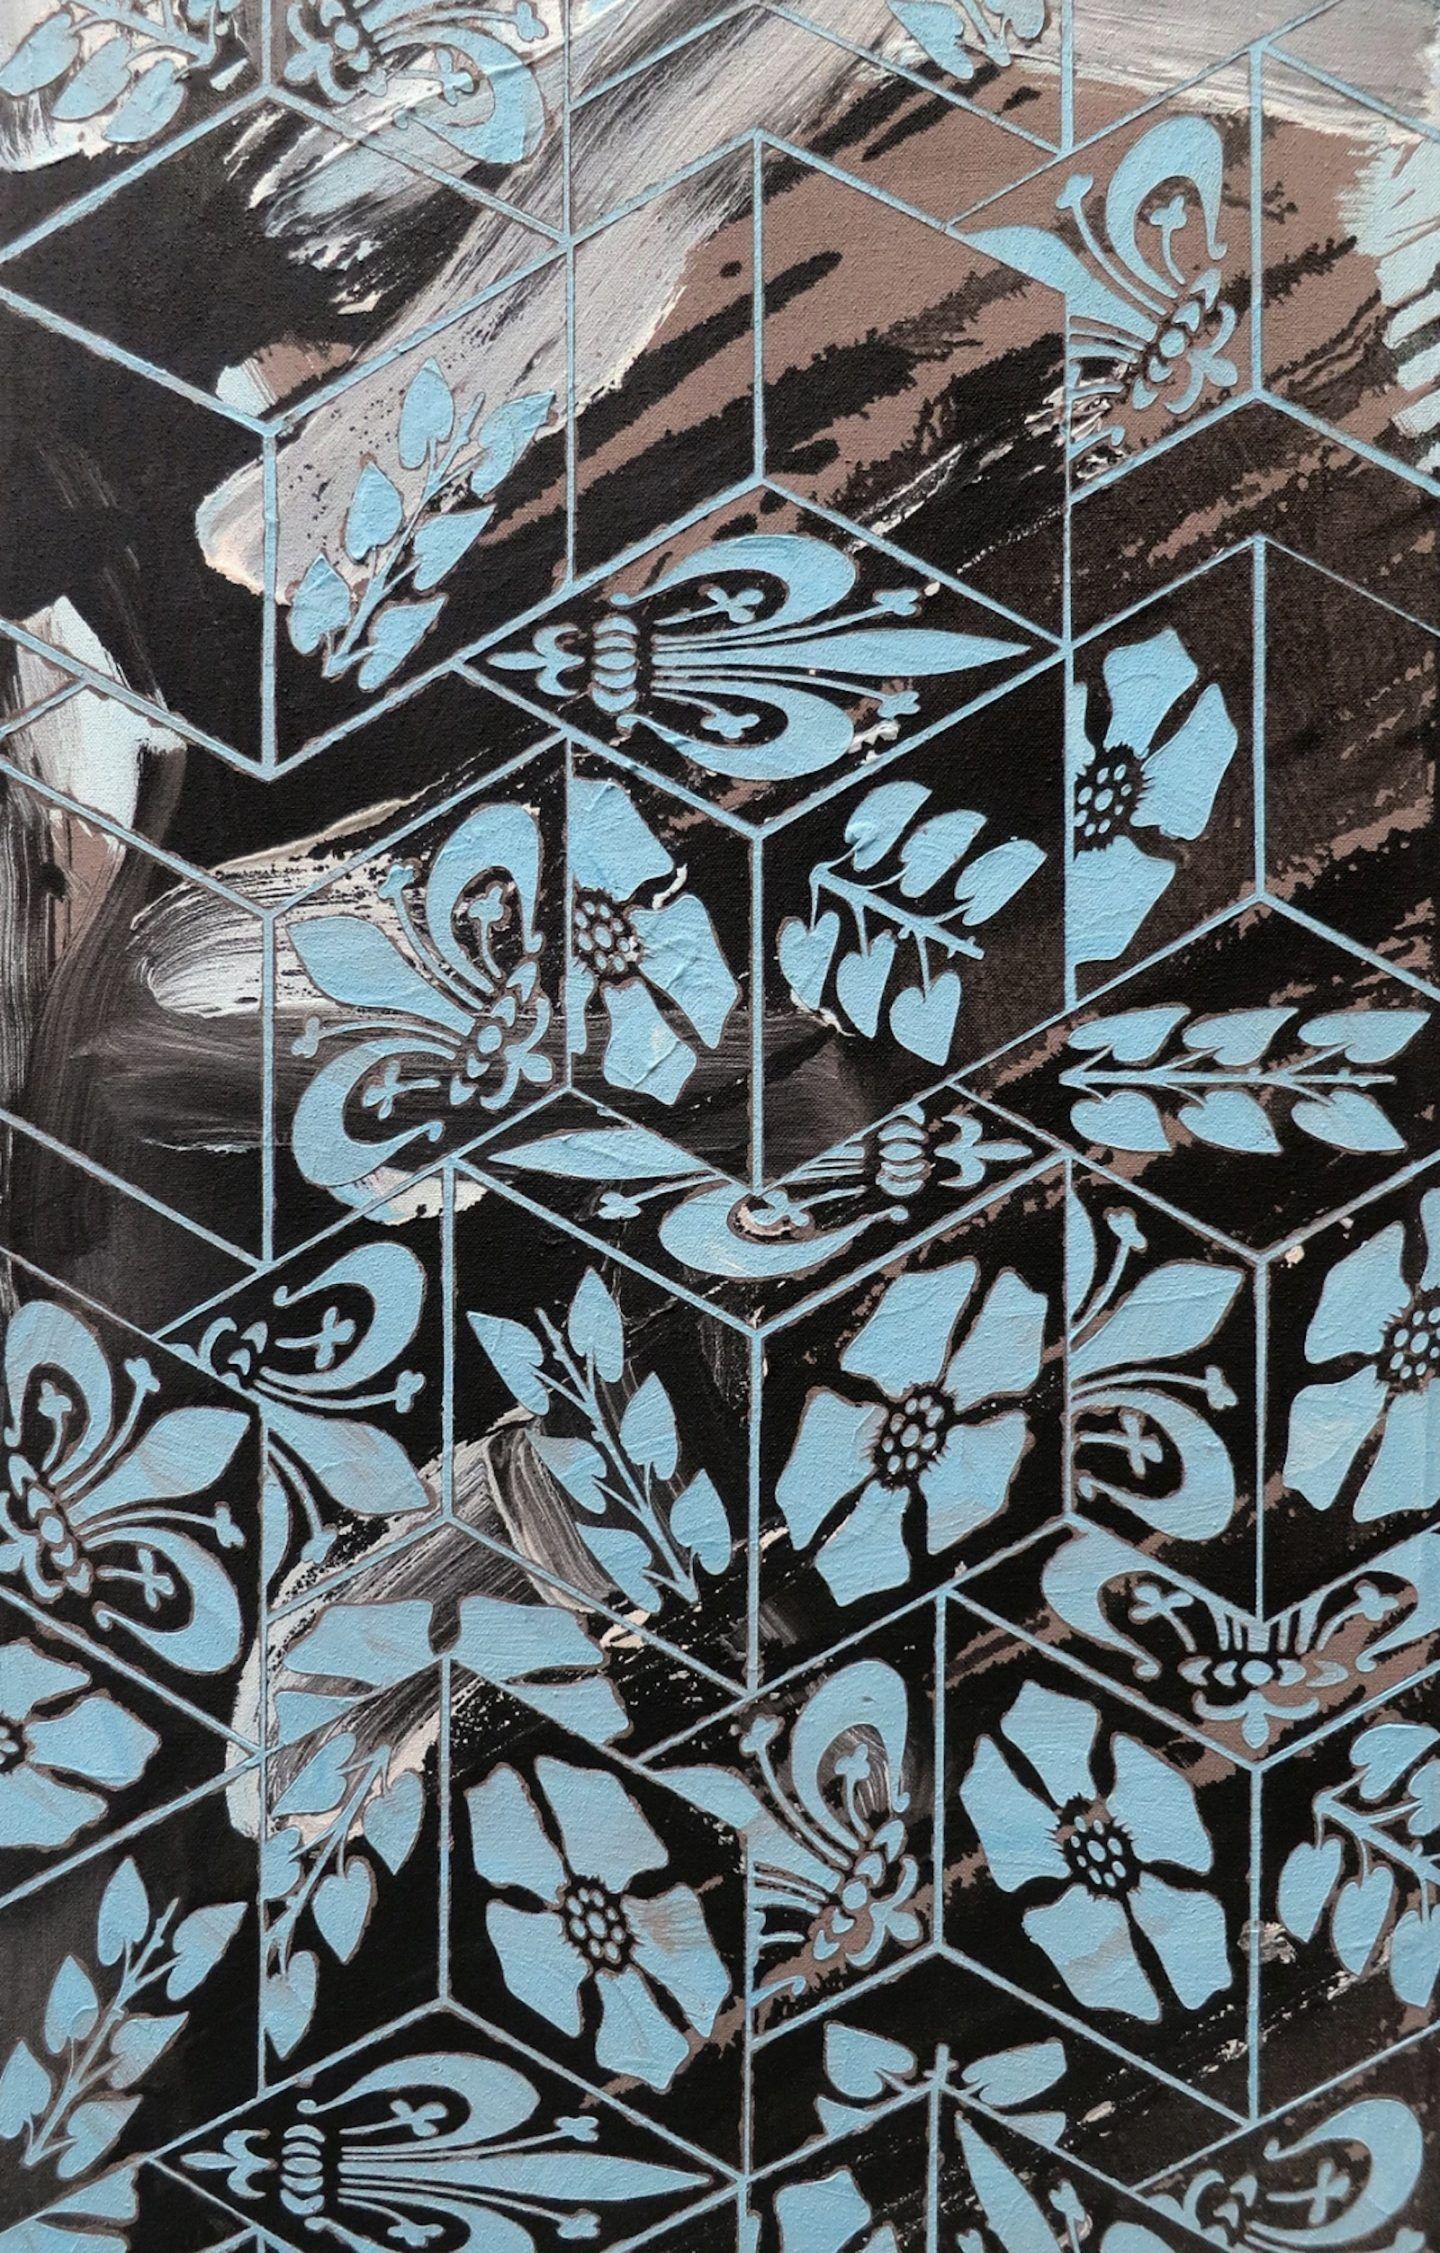 IGNANT-Art-Robert-Dawson-Aesthetic-Sabbotage-010